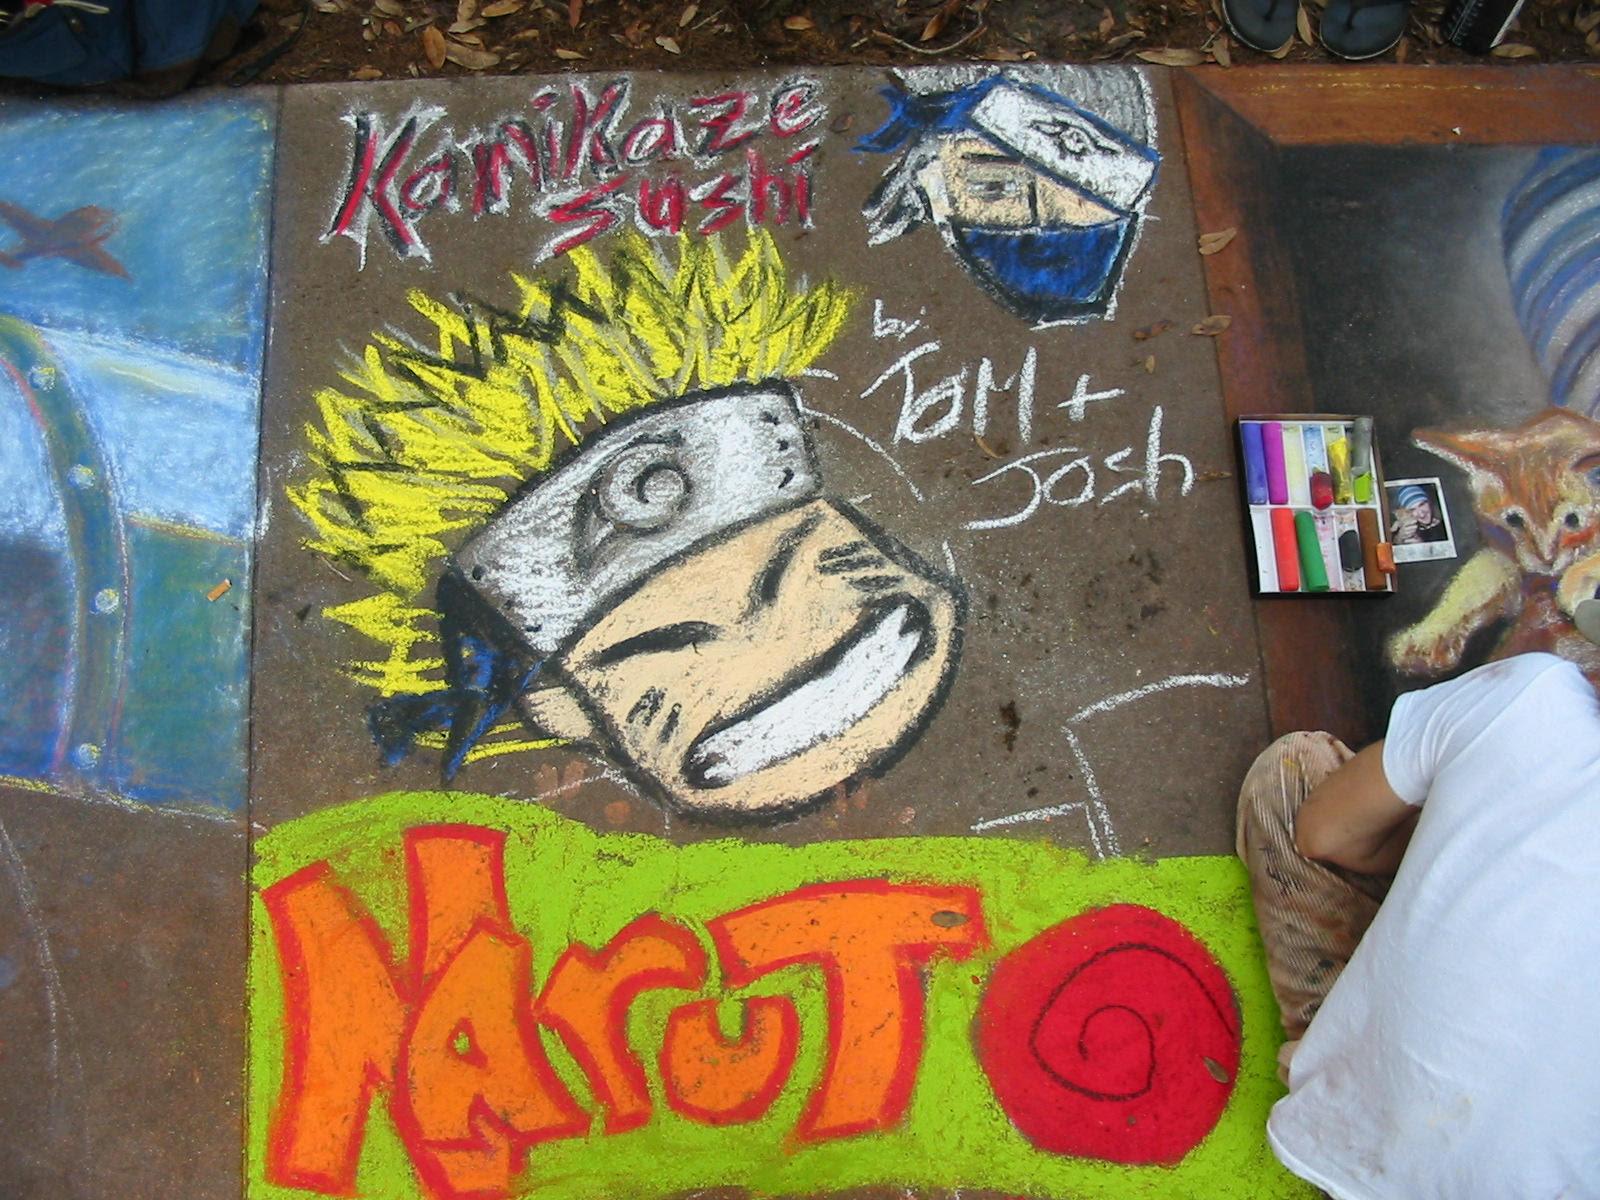 Download 108+ Wallpaper Naruto Graffiti HD Gratid